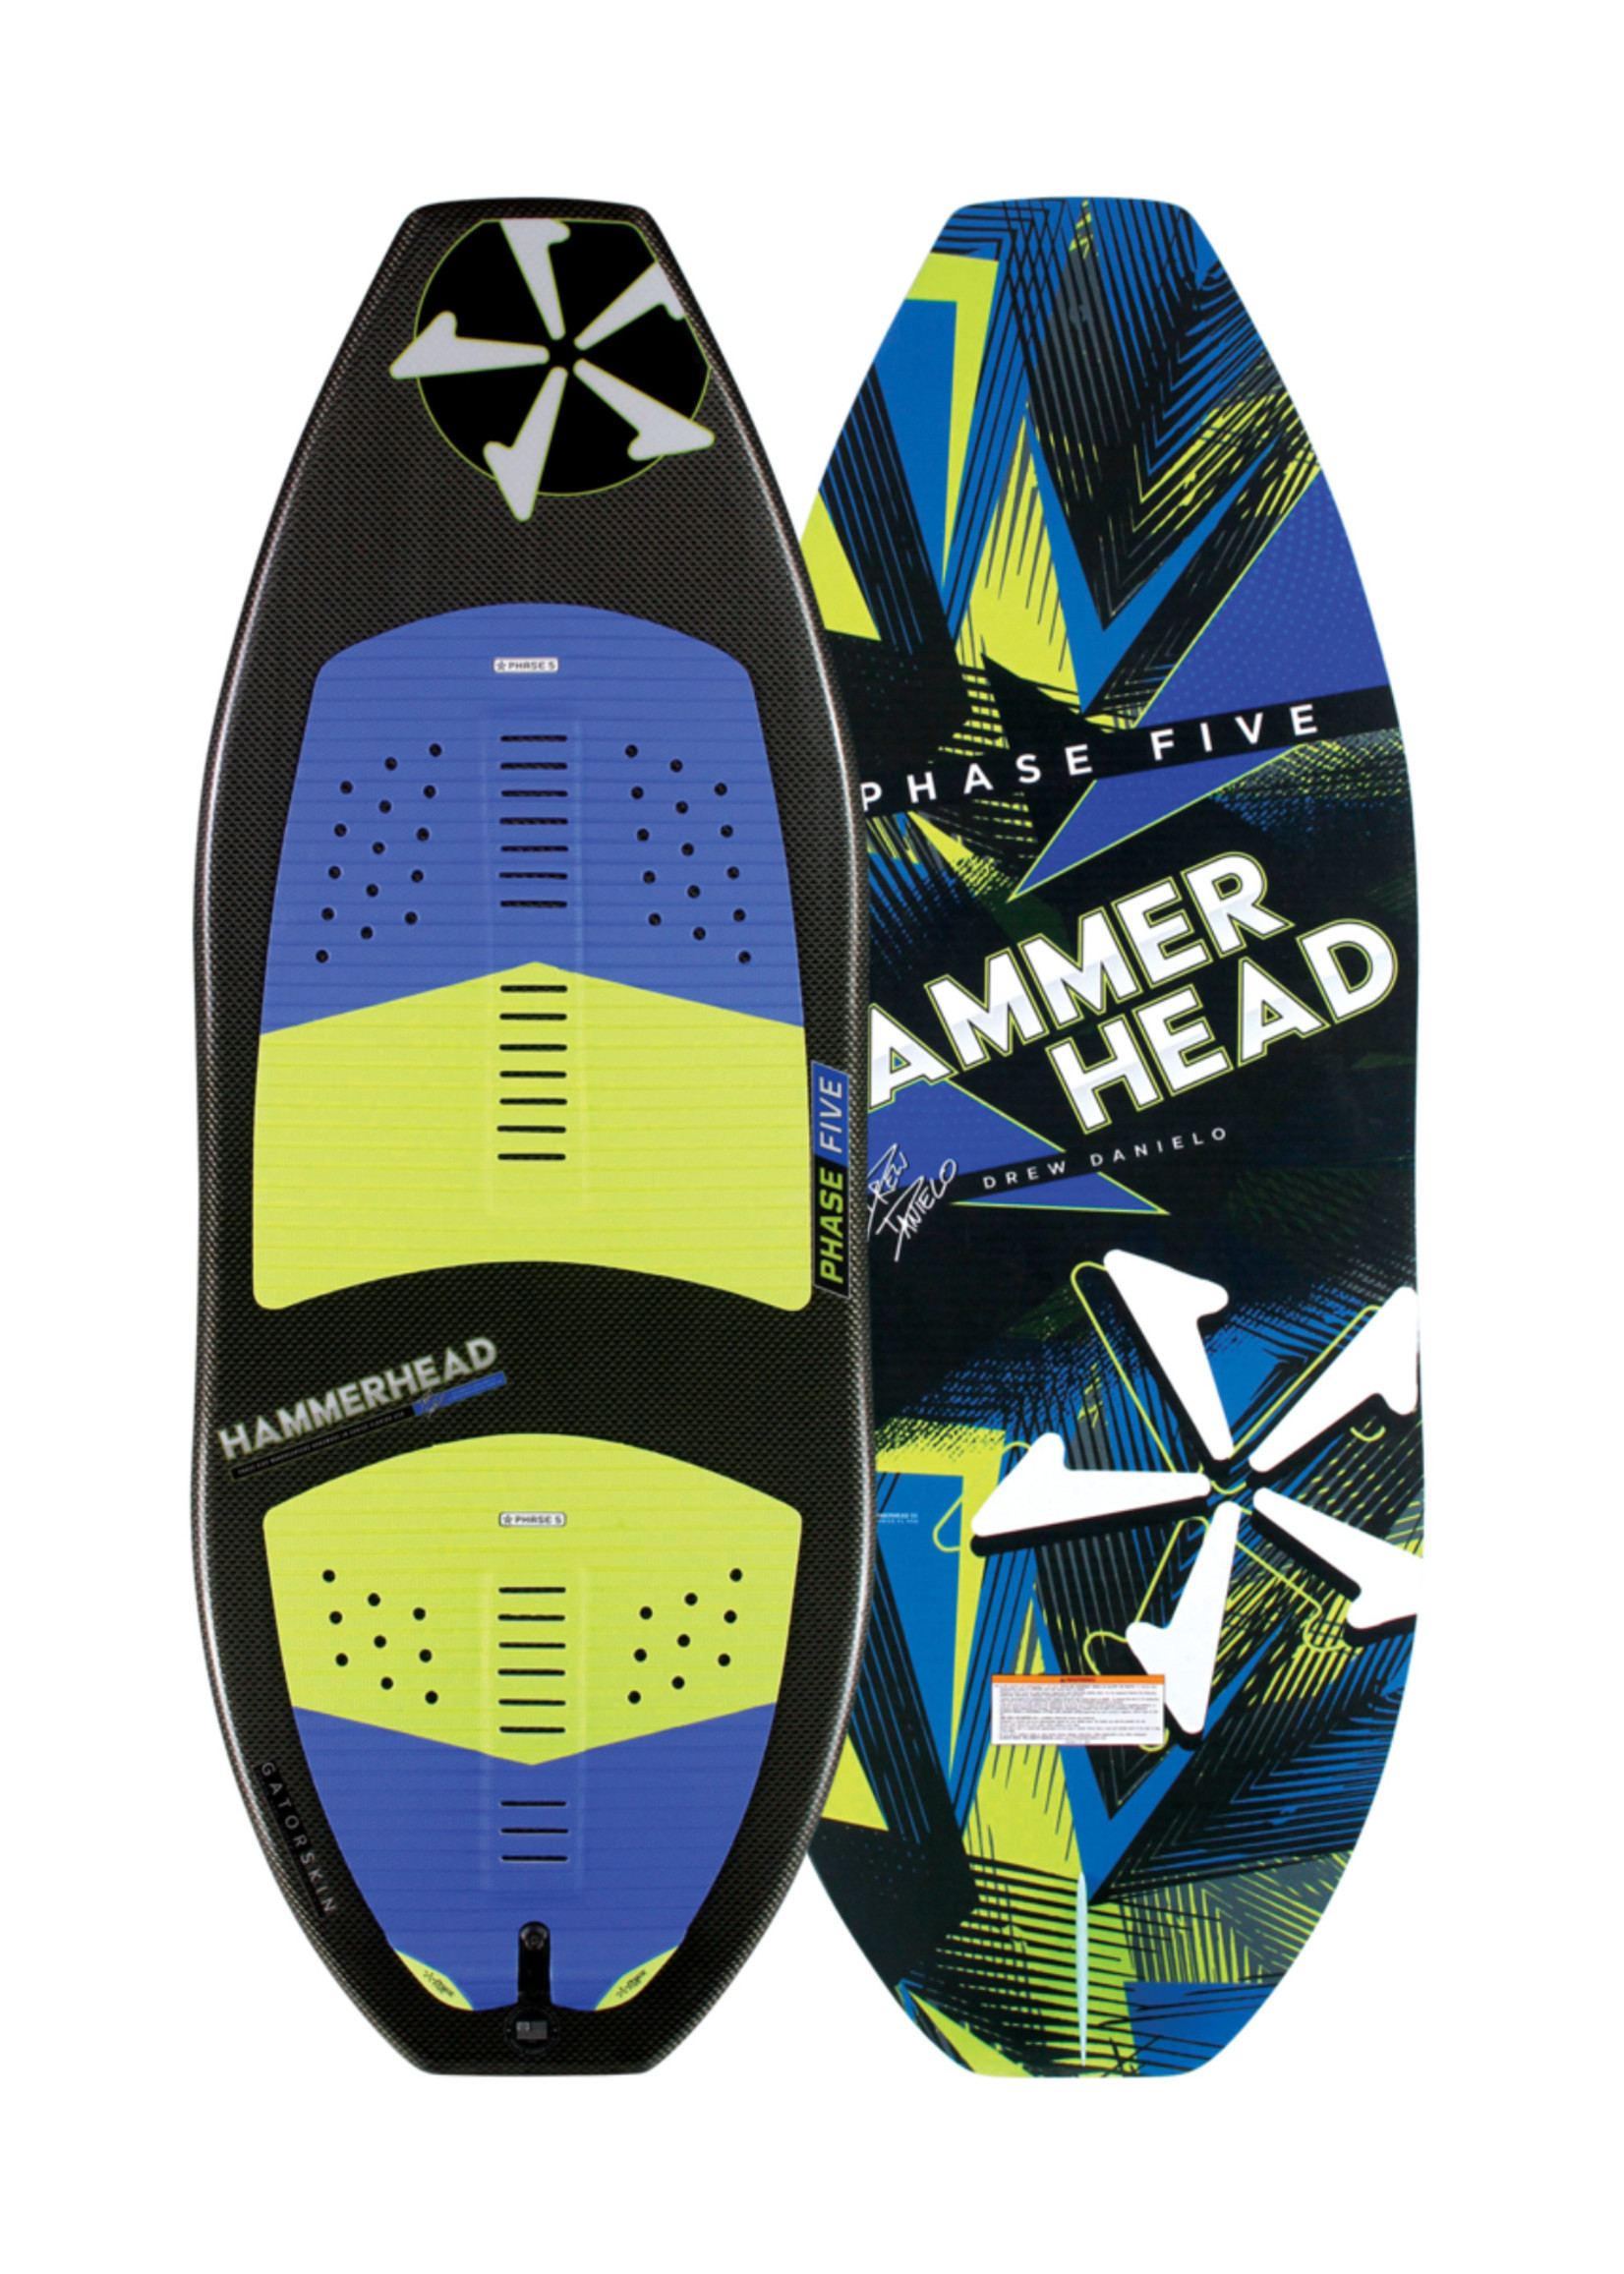 "Phase Five Phase Five Hammerhead 55"" Skim-Style Wakesurf"